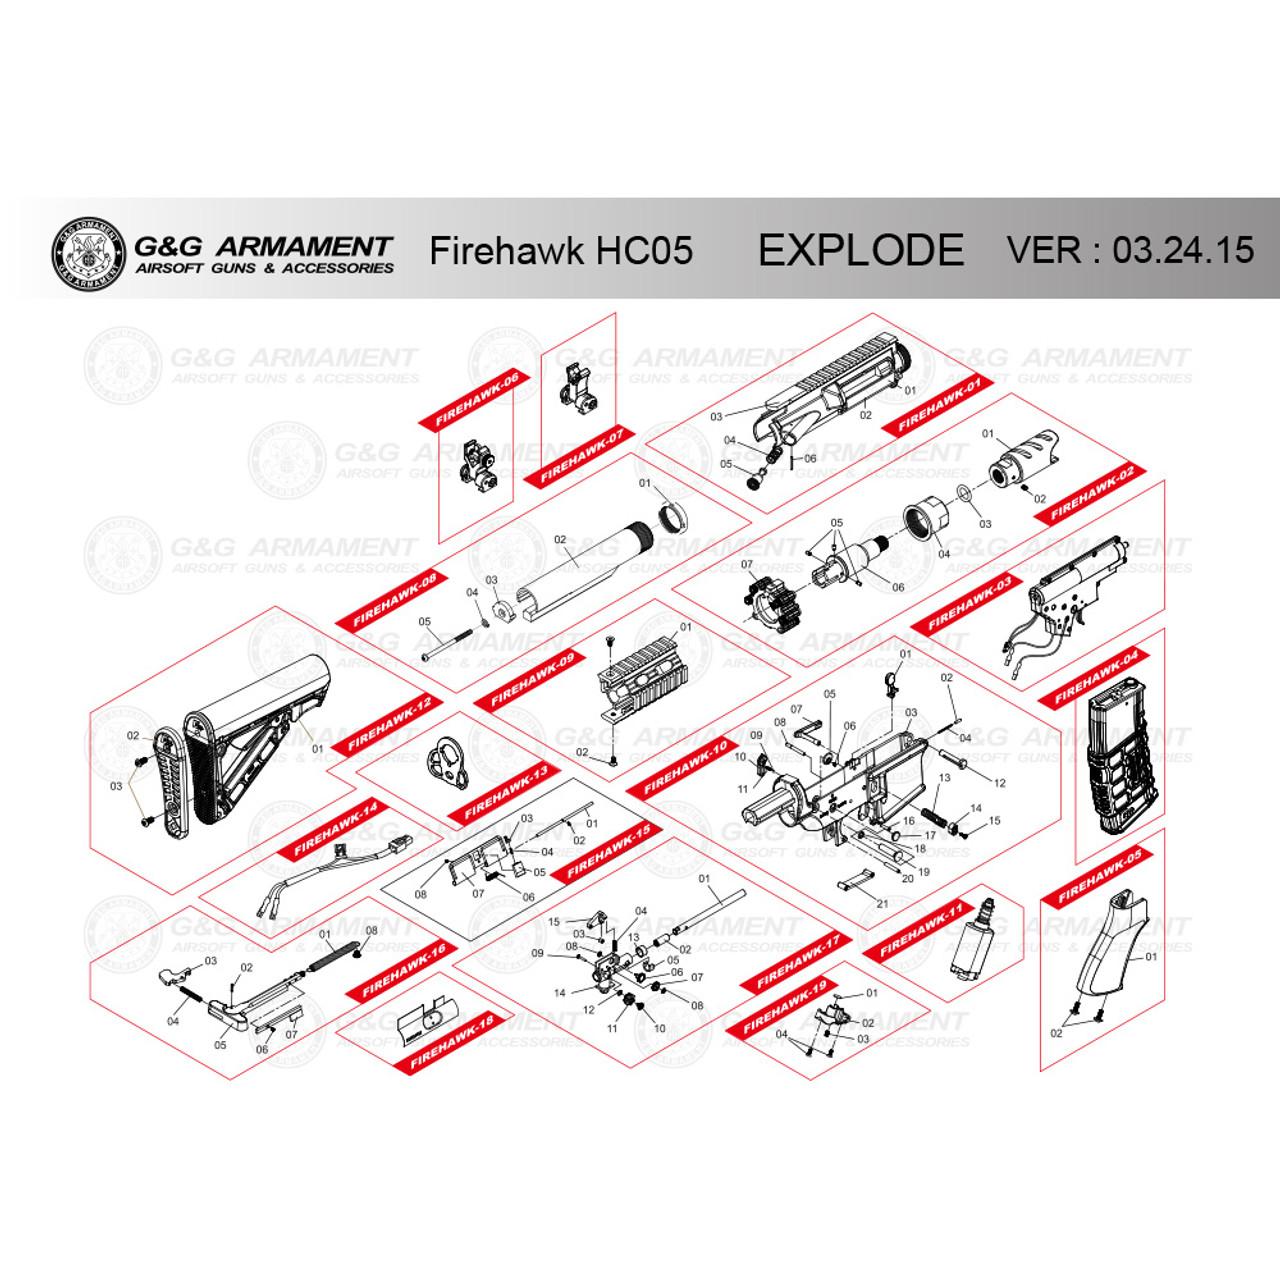 firehawk wiring diagram wiring diagram library firehawk wiring diagram [ 1280 x 1280 Pixel ]